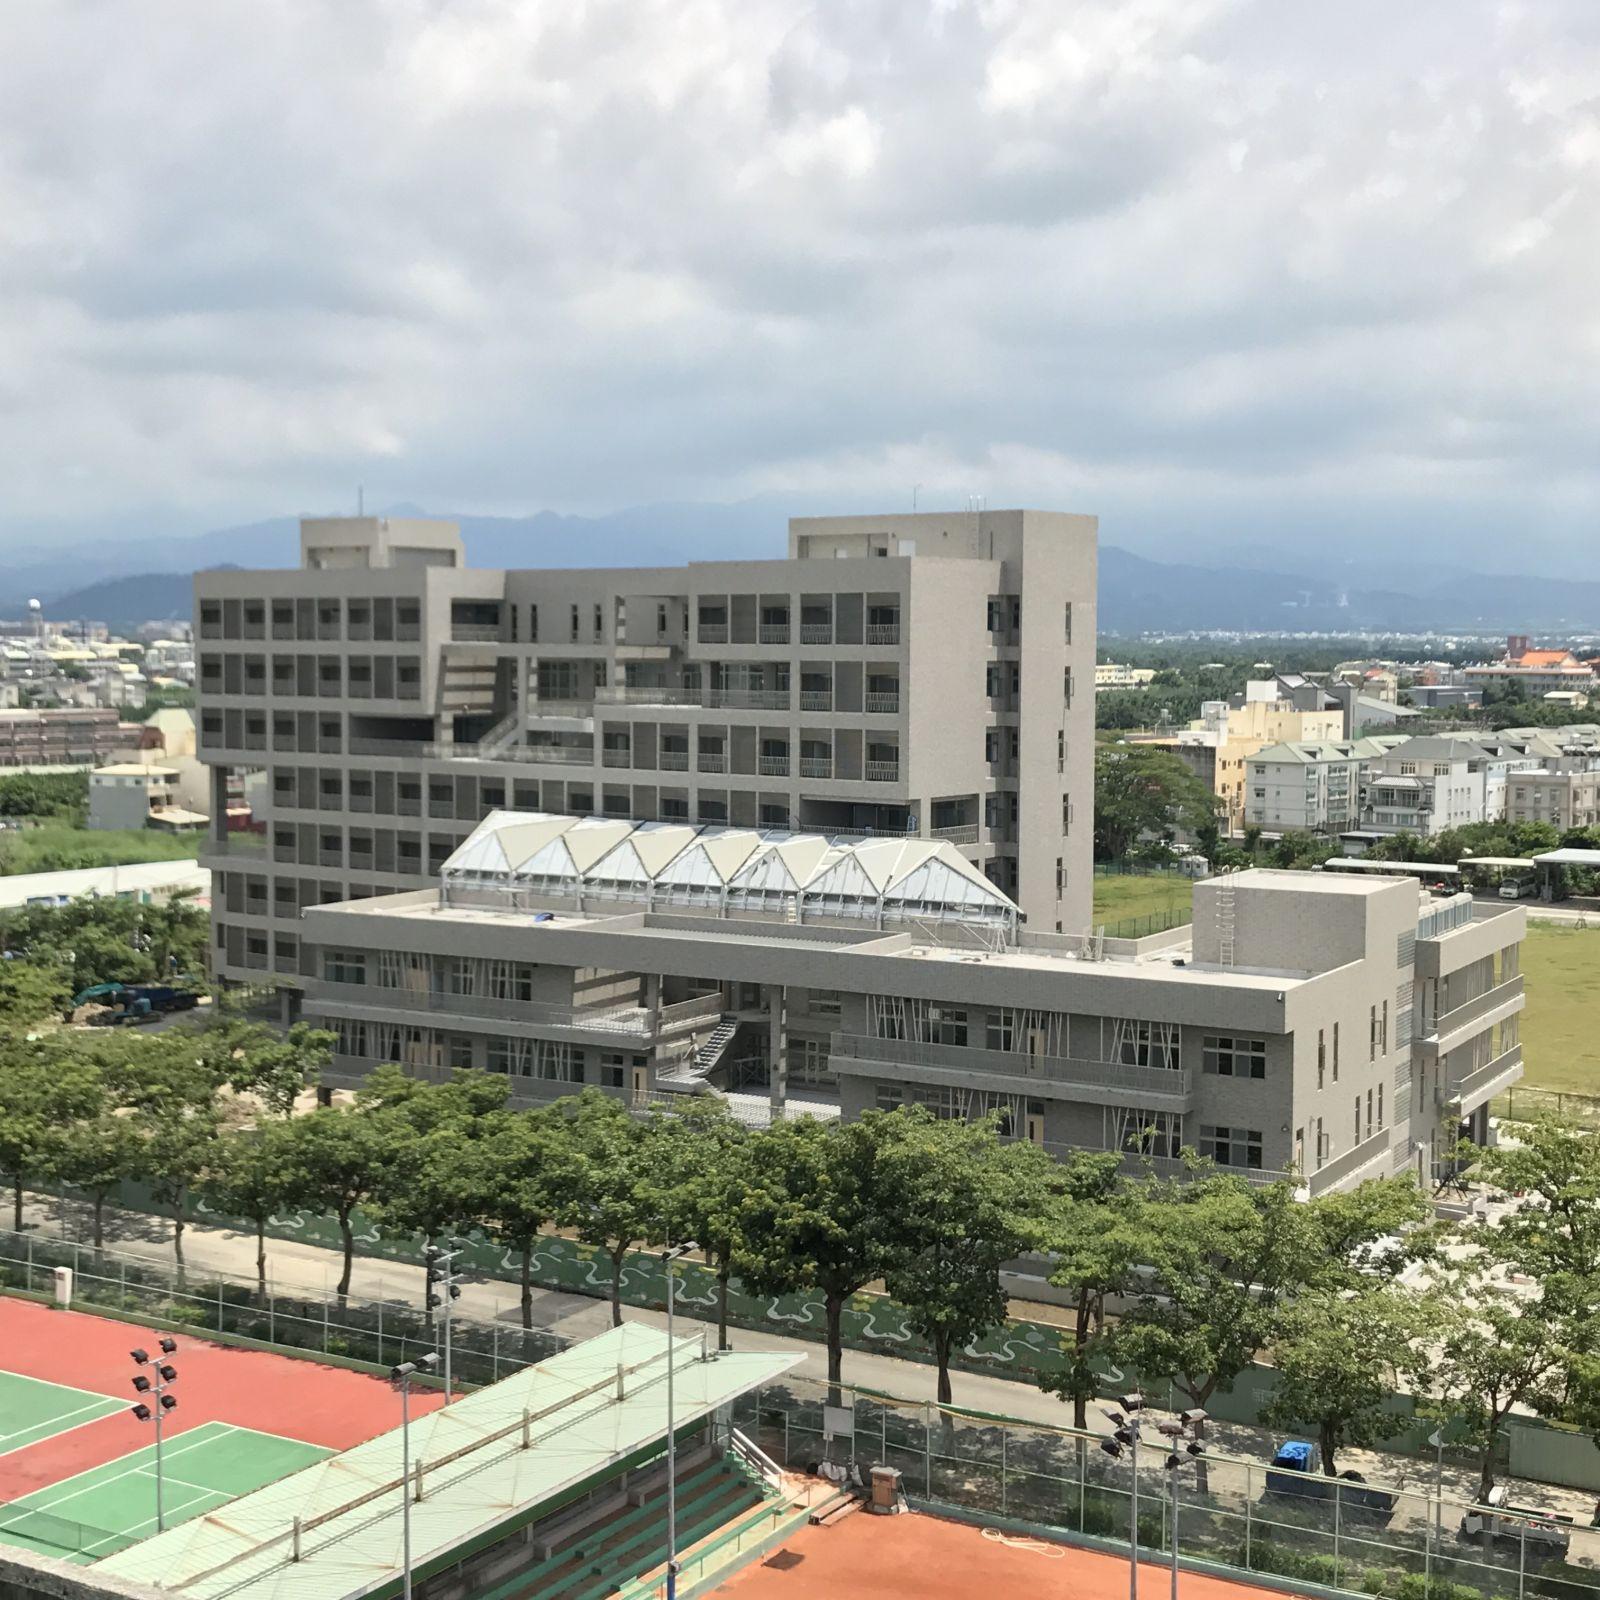 Research center of yutech university